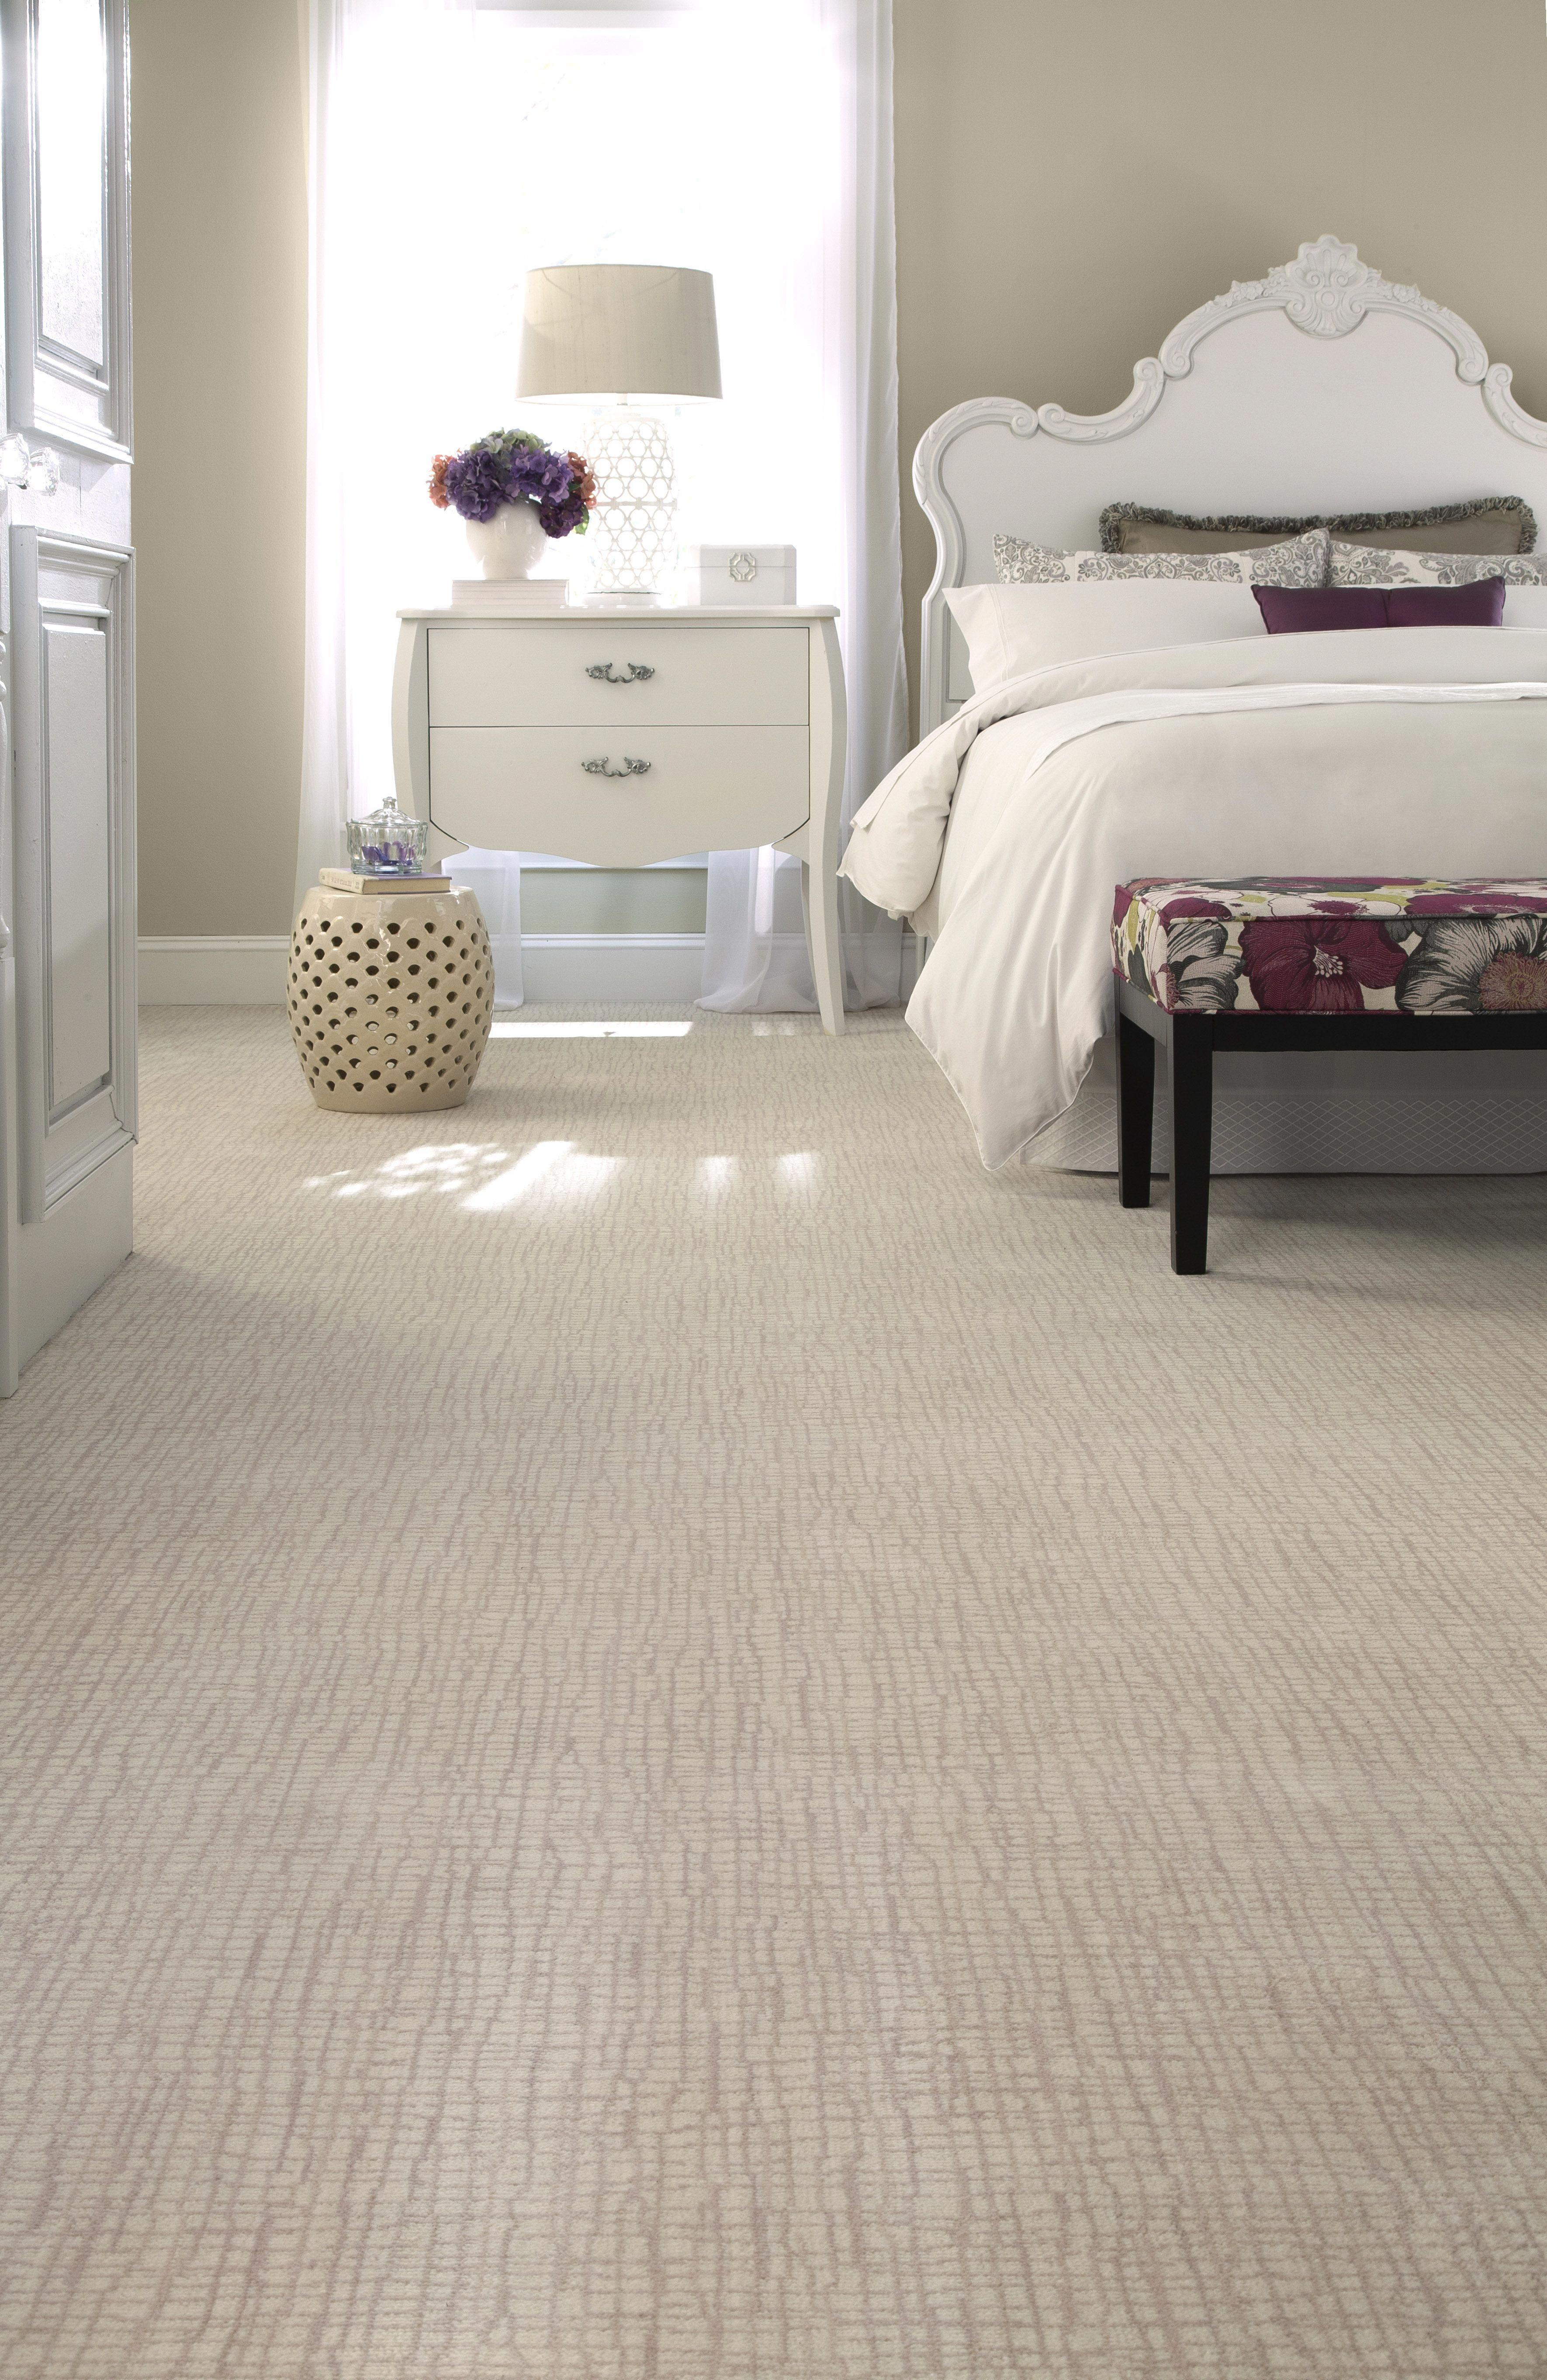 Best Buy Carpet Runner By The Foot Cheapcarpetrunnerssydney 400 x 300